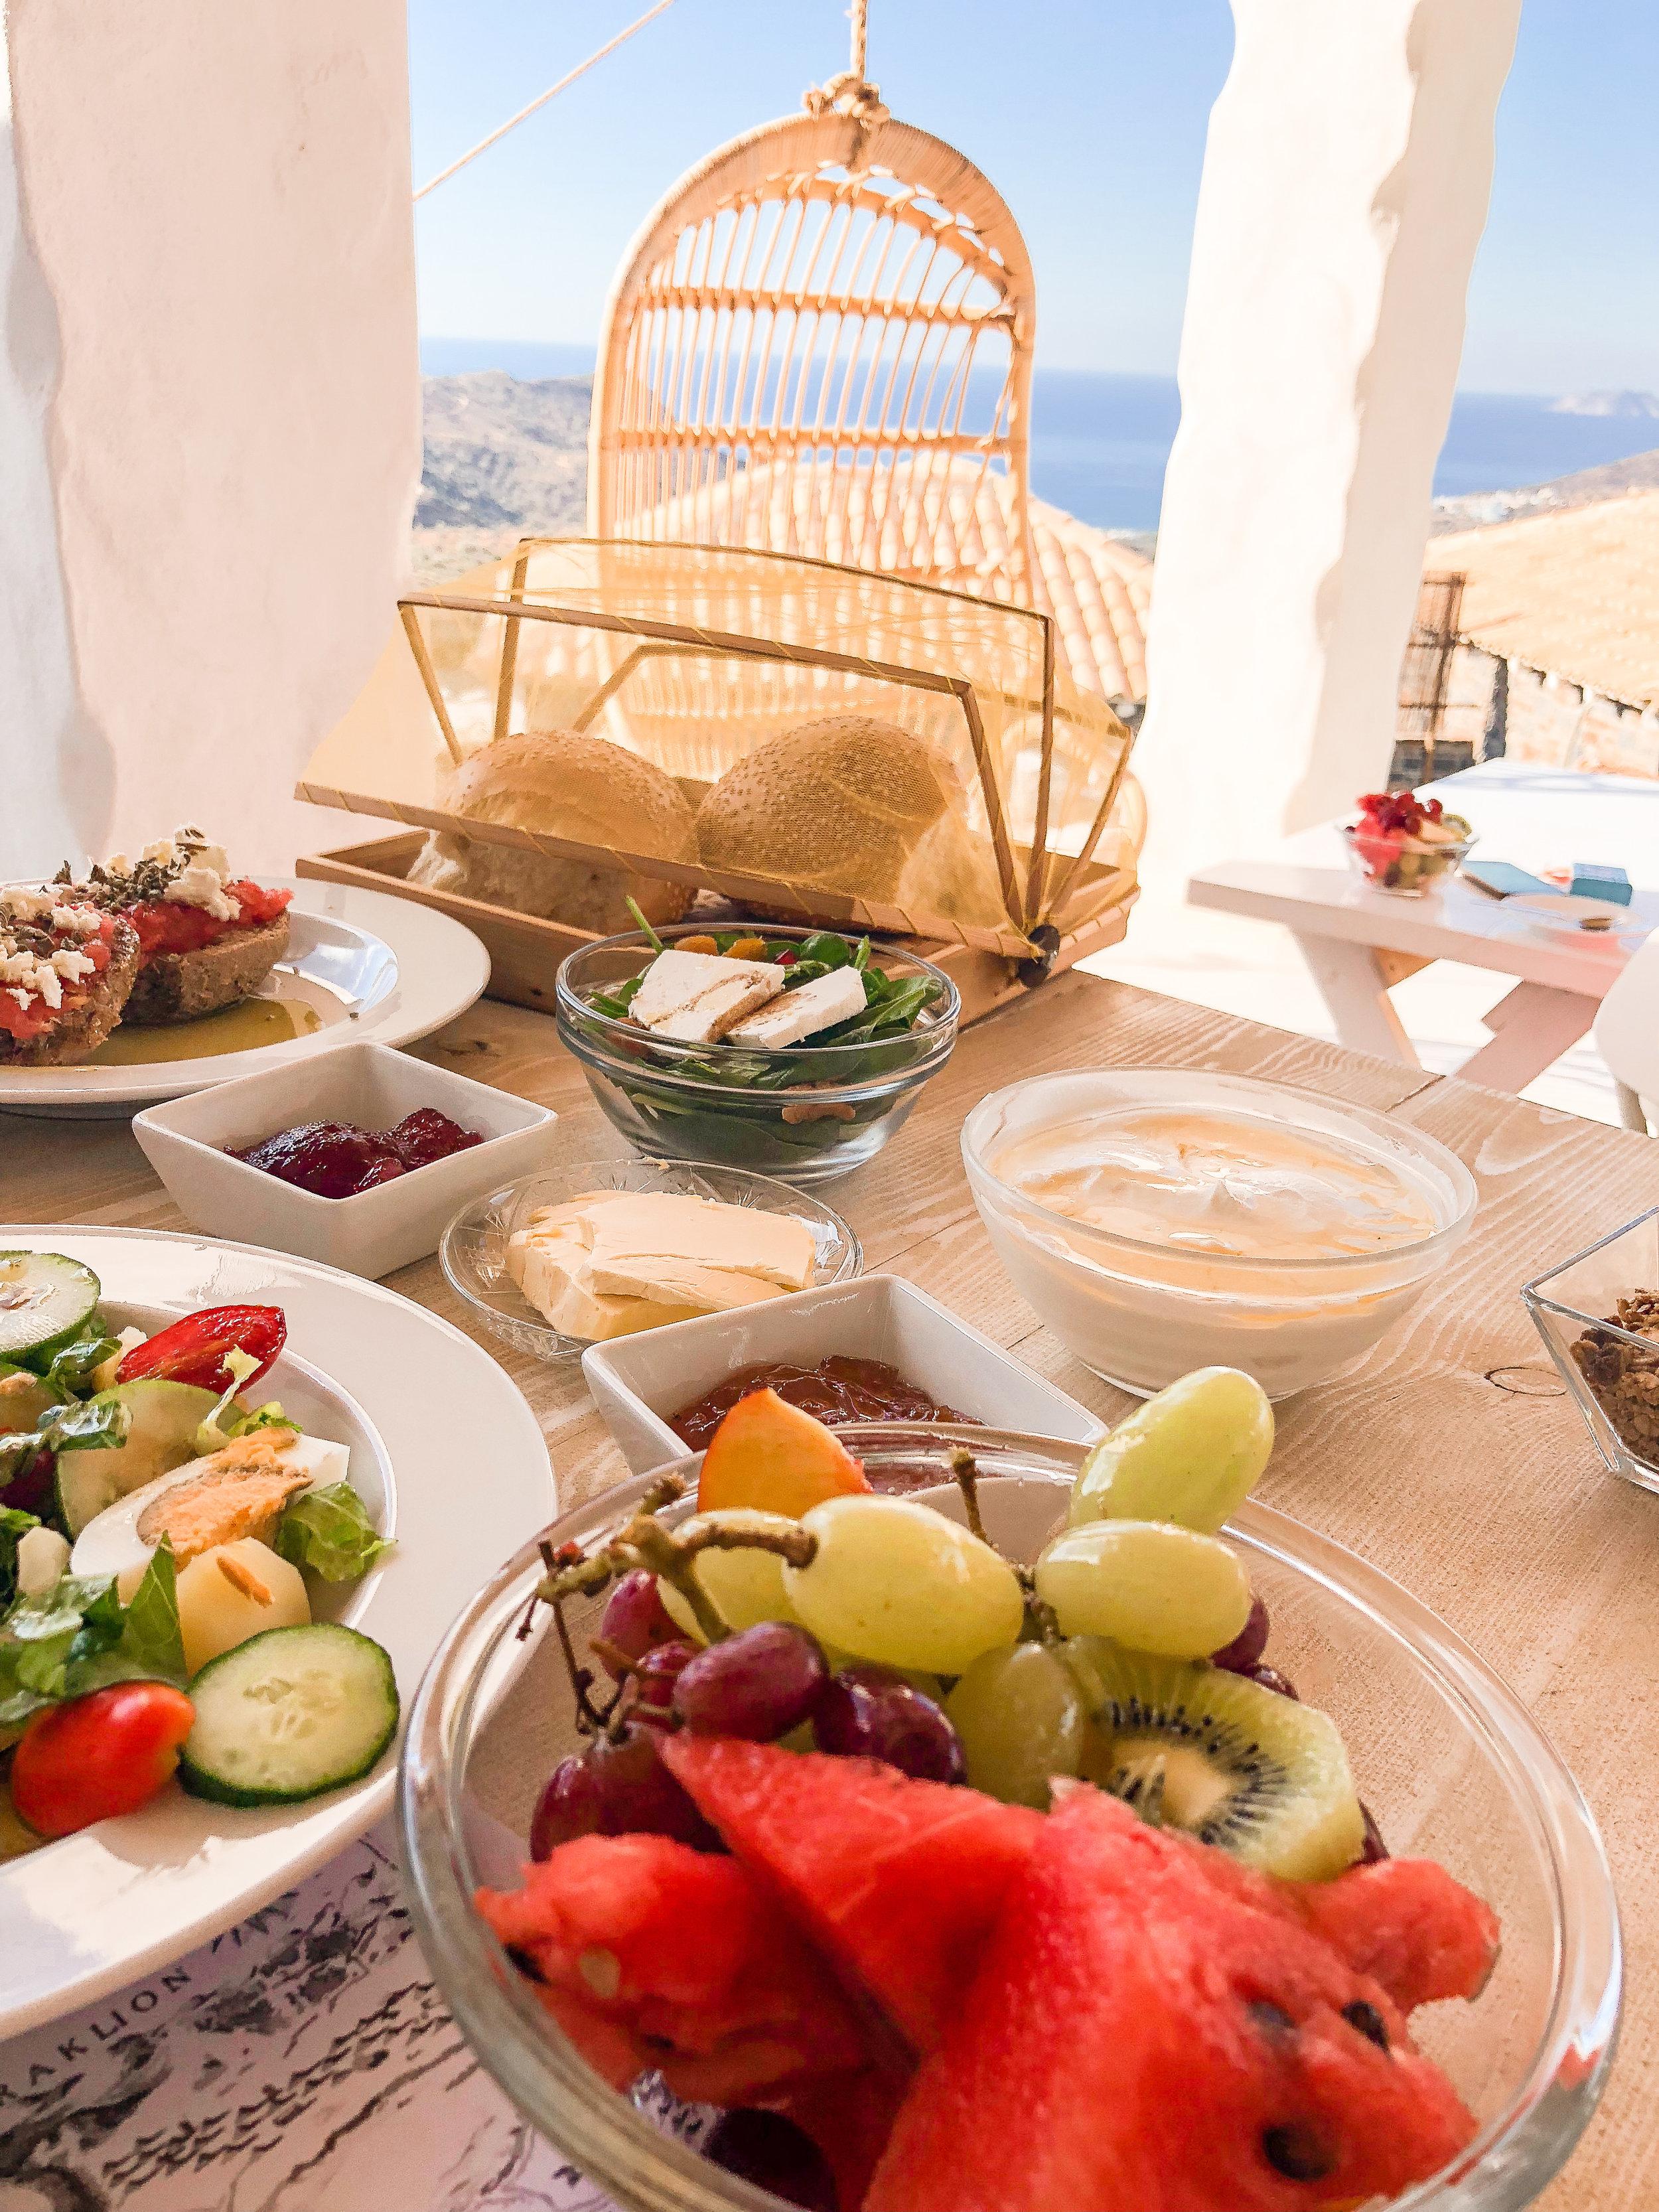 Fresh fruit, locally made greek yogurt and honey, and crusty bread with tomato bruchetta and feta. My dream breakfast!